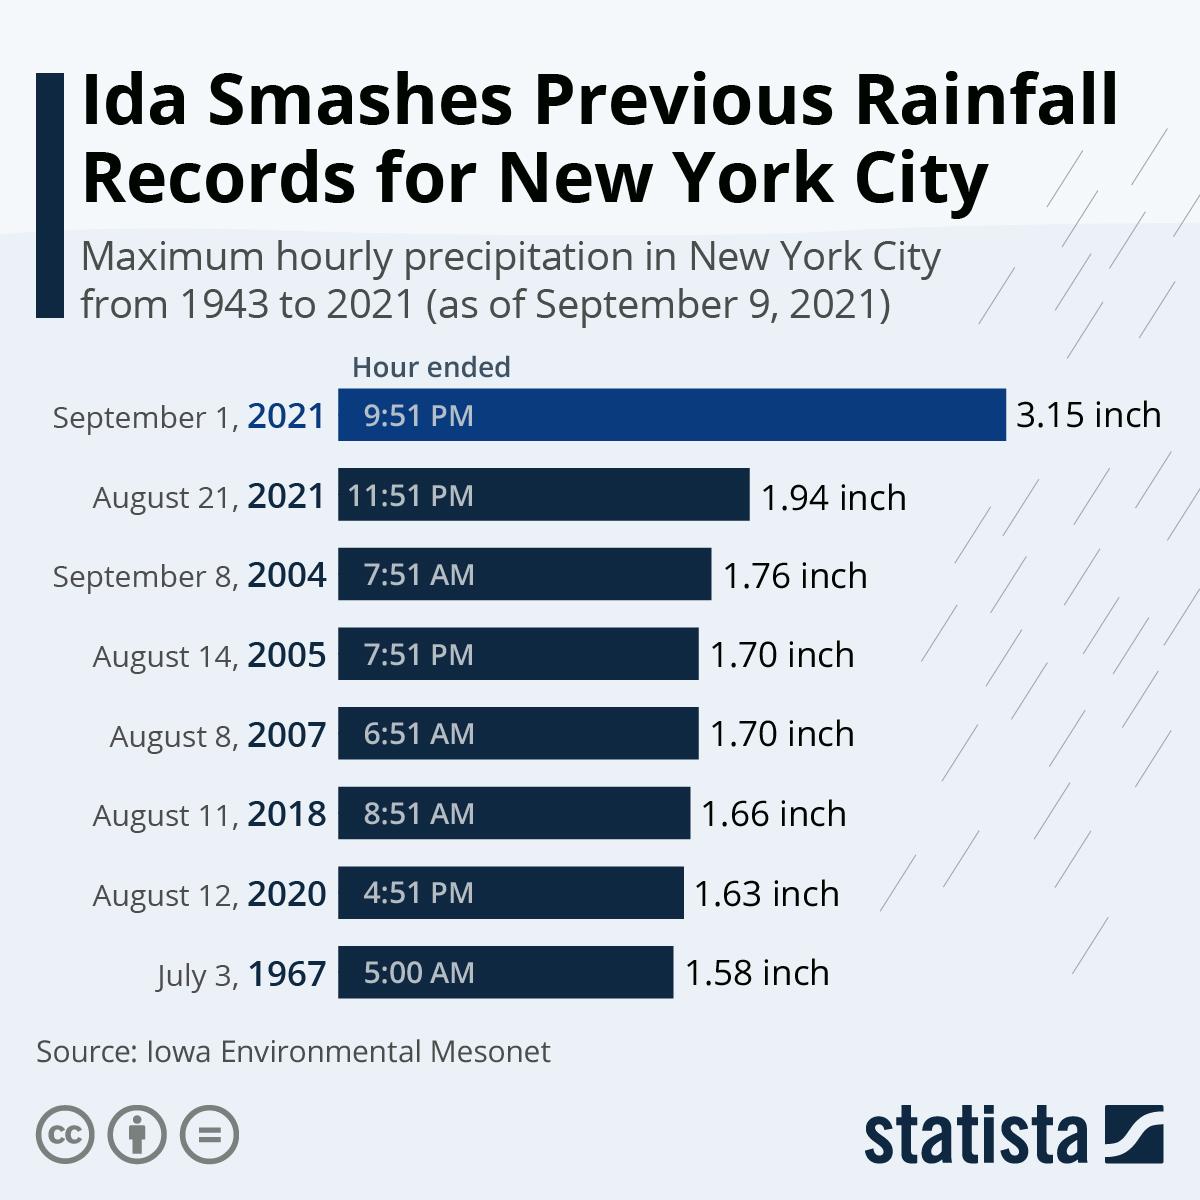 Ida Smashes Previous Rainfall Records for New York City